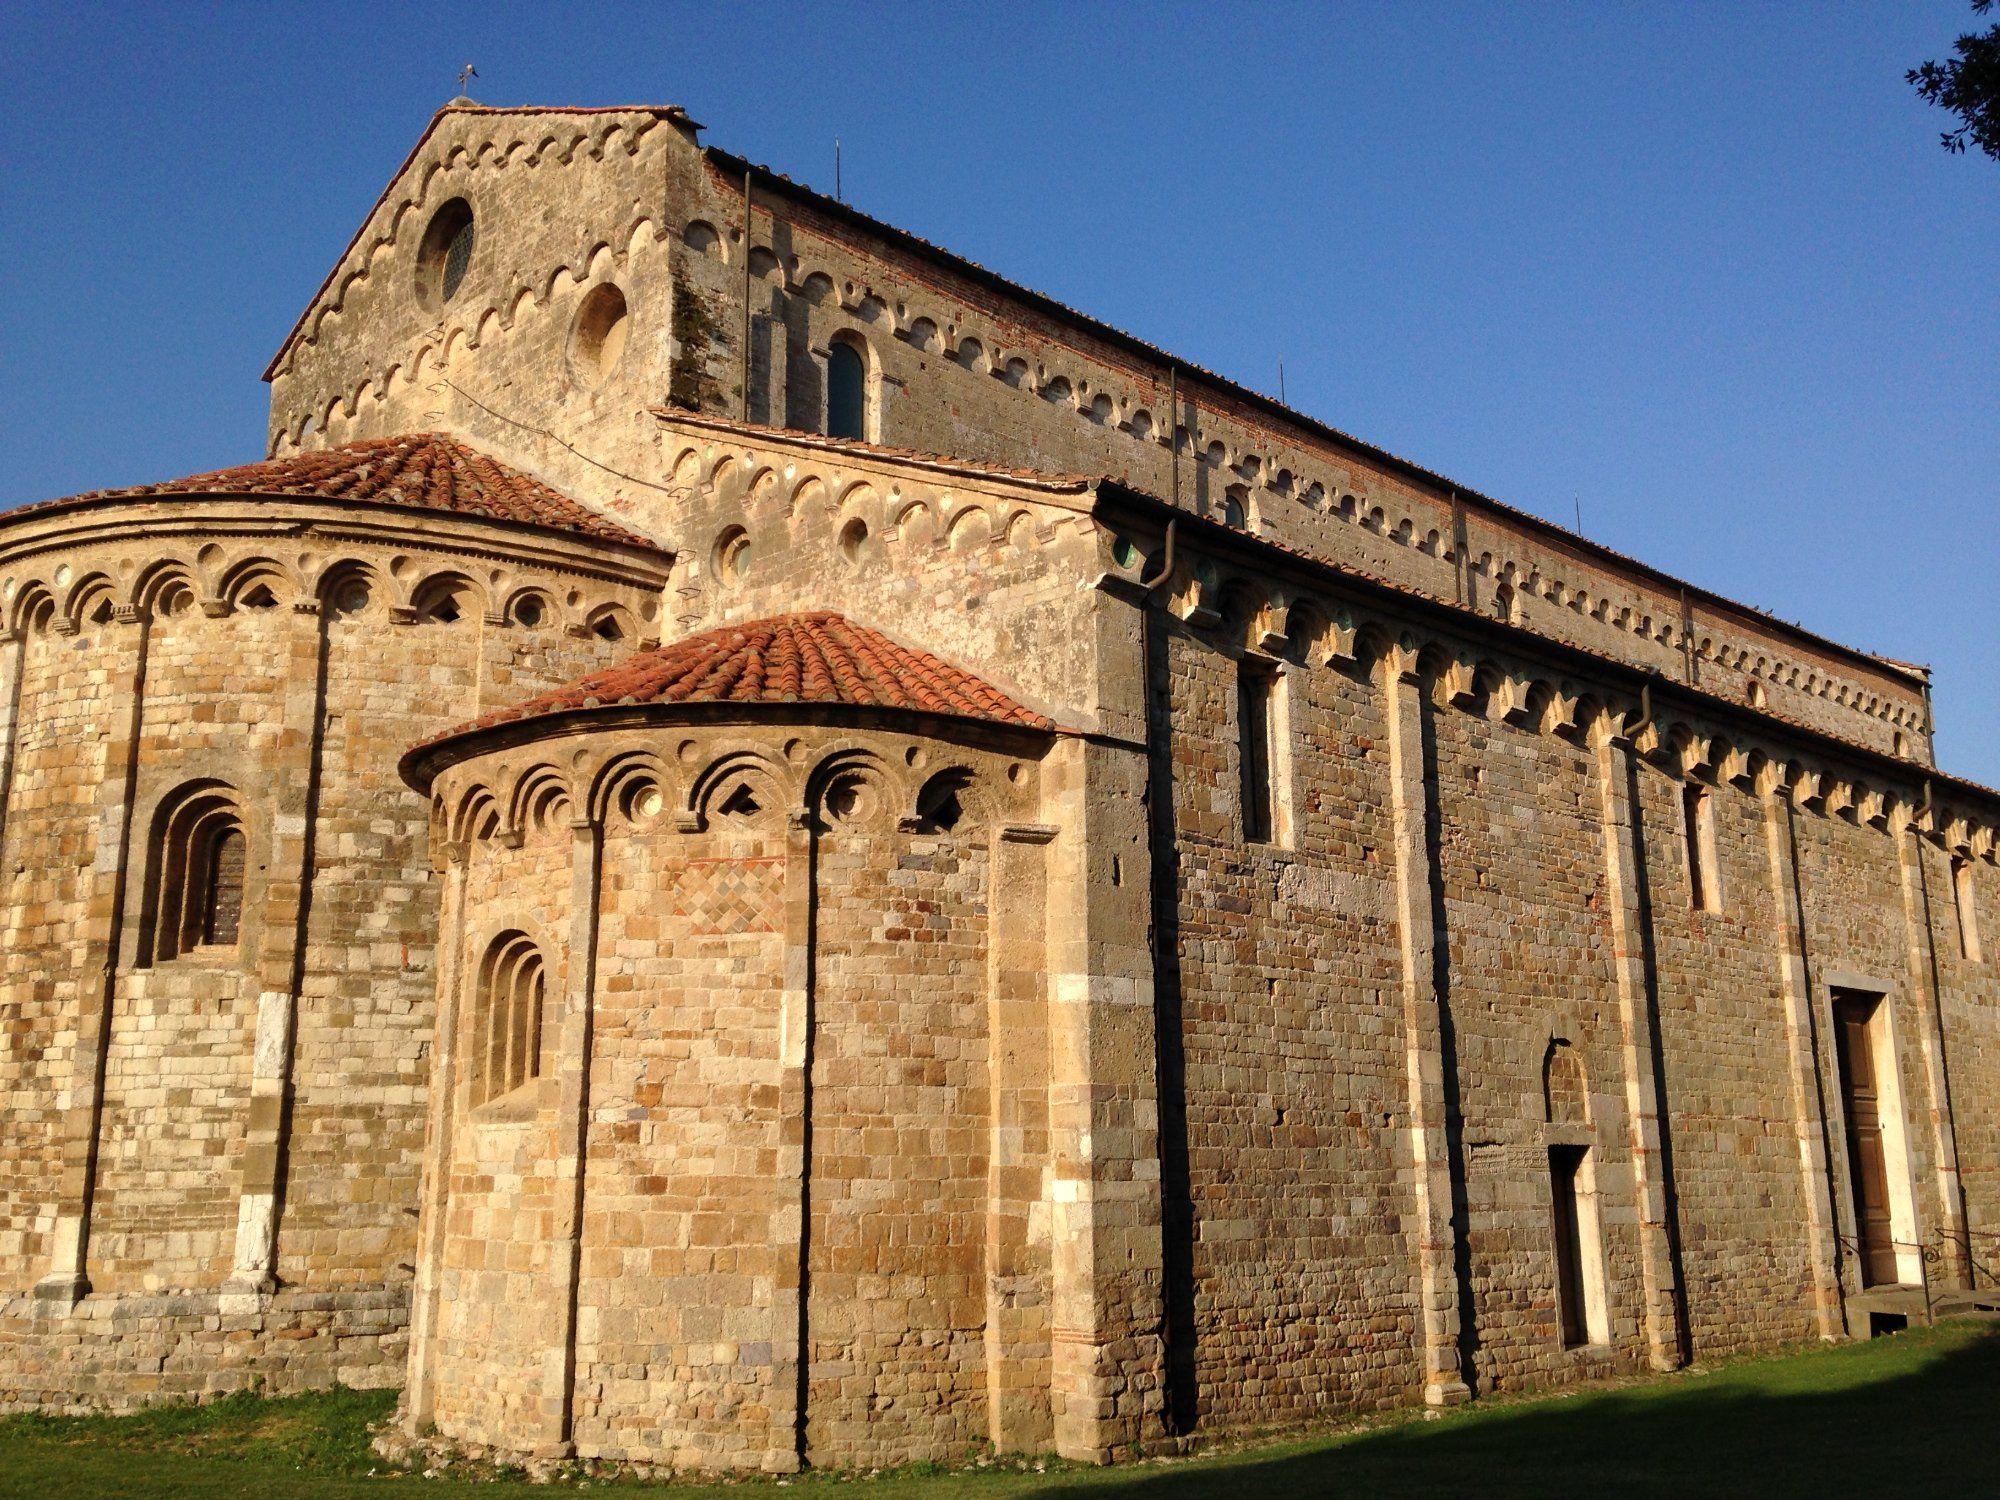 Basilica romanica di San Piero a Grado, Pisa - TripAdvisor